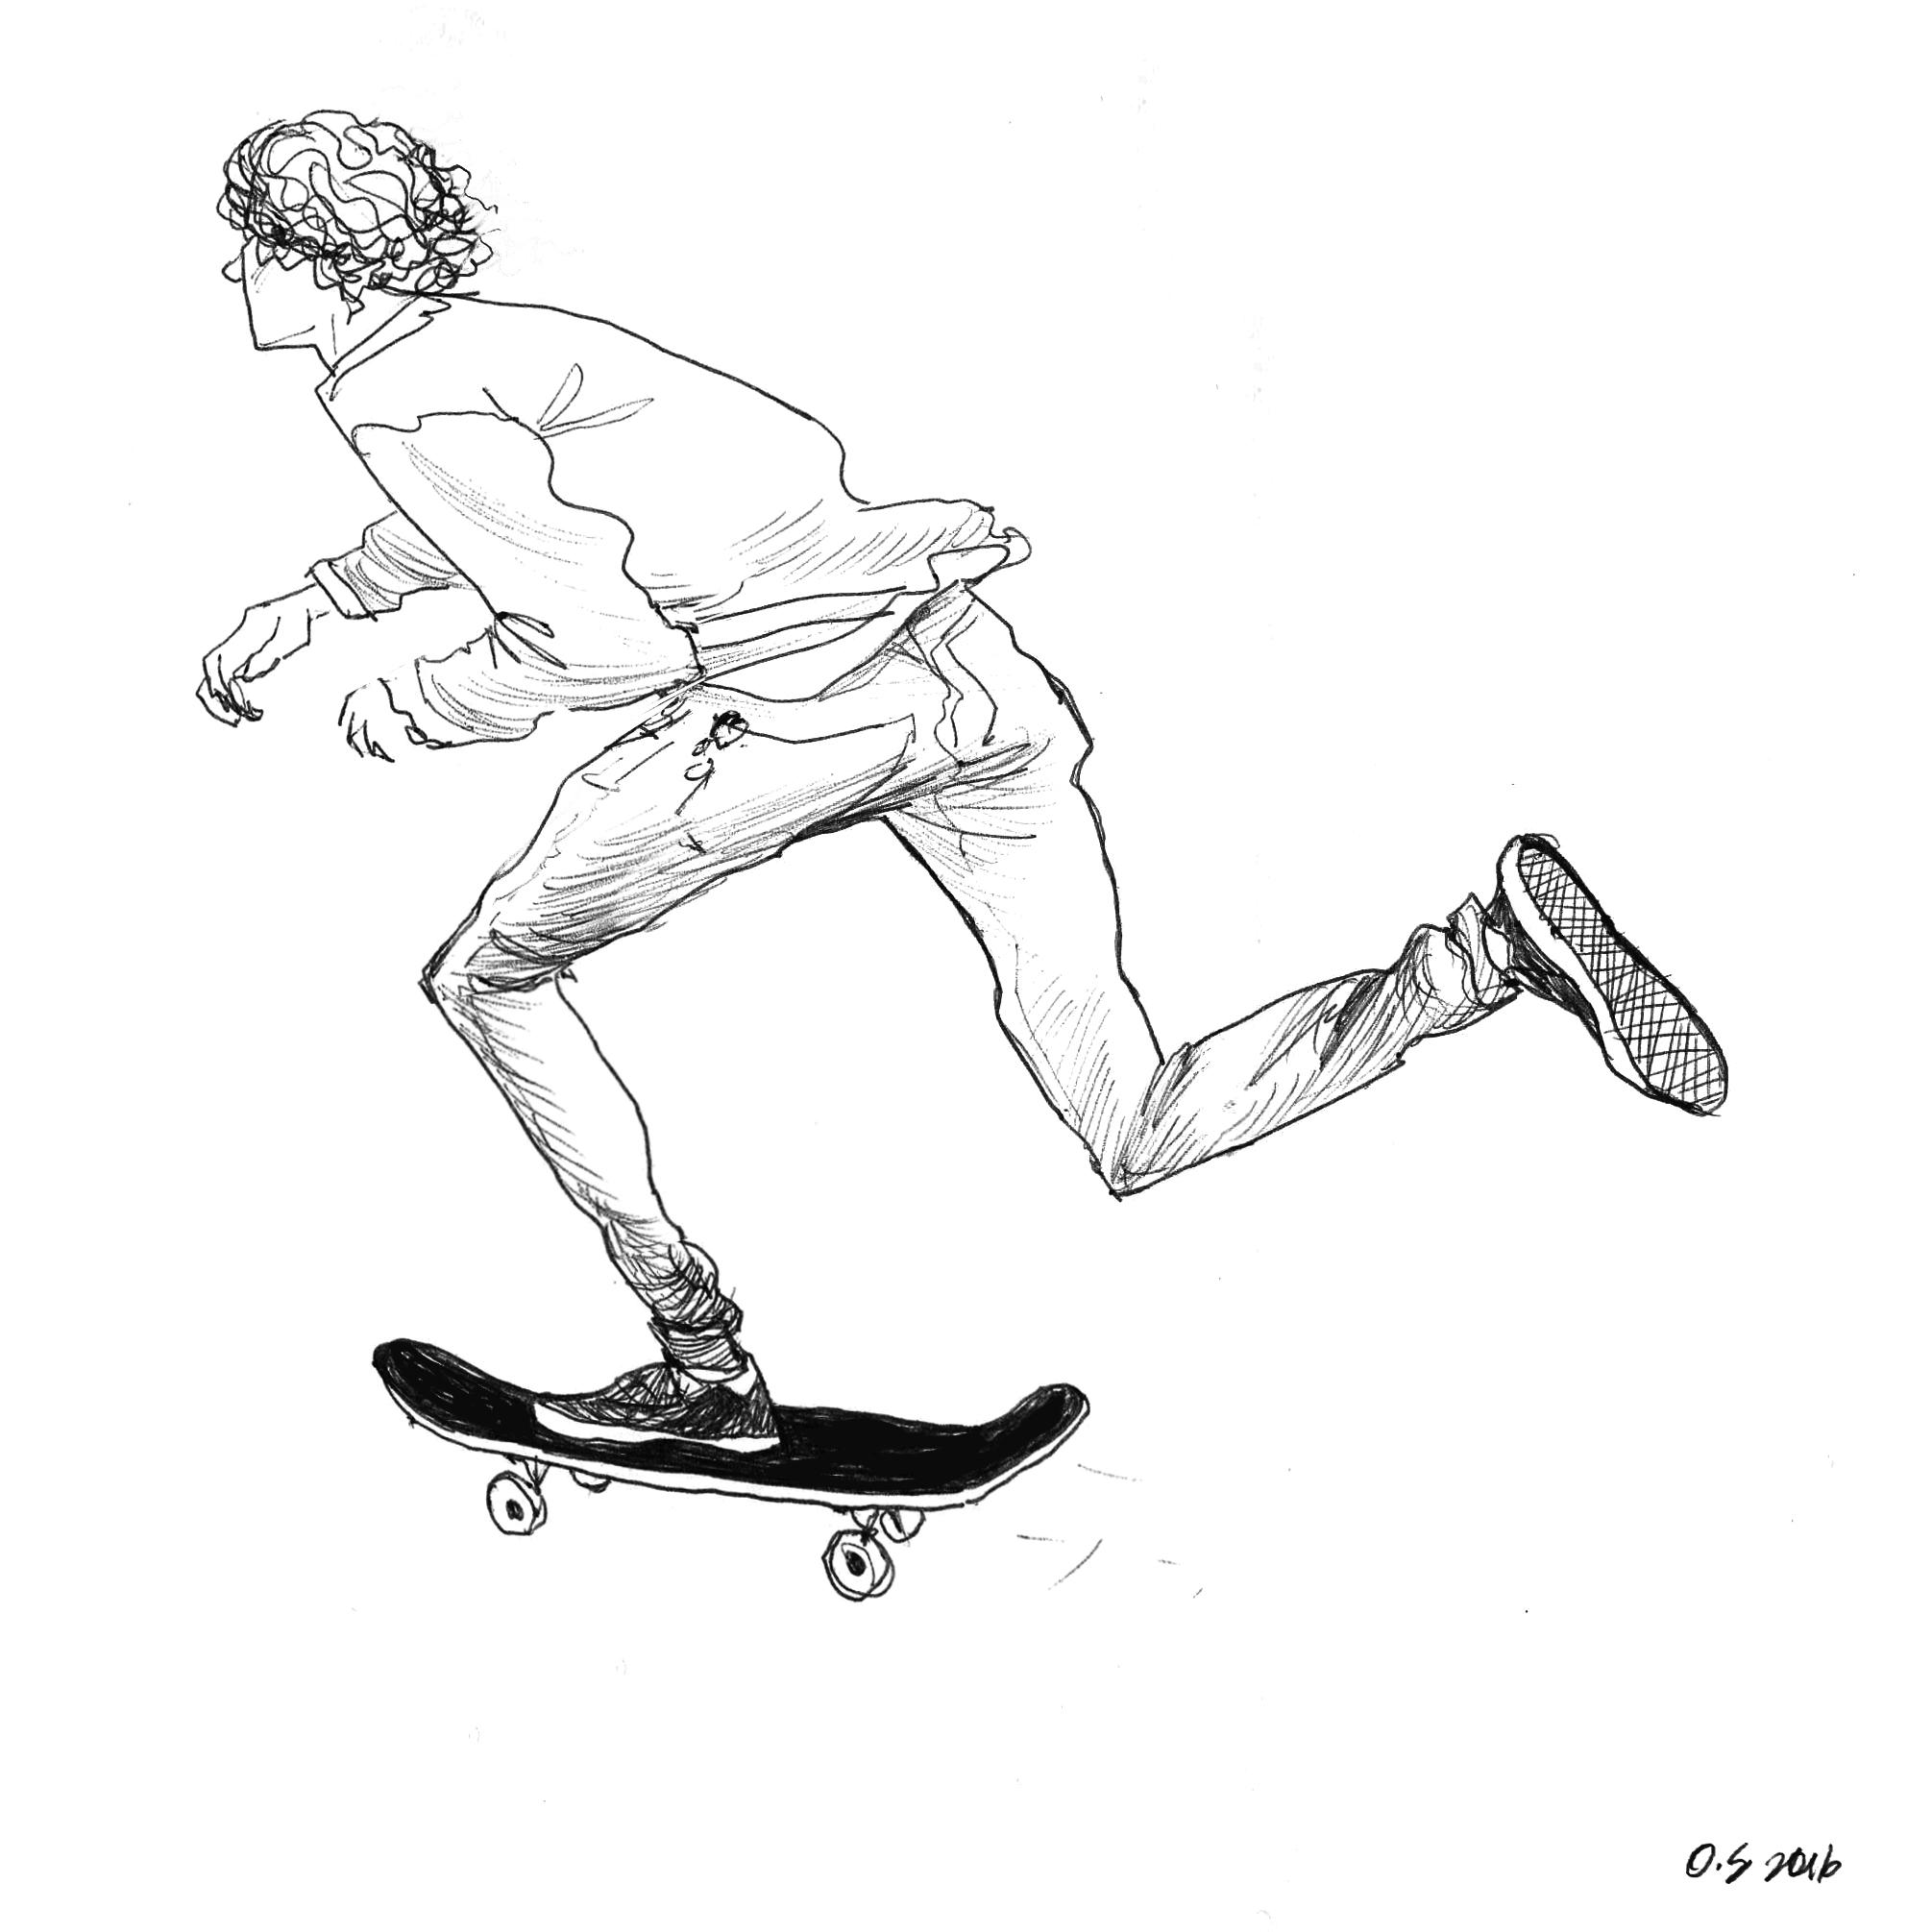 2011x2011 Sketchbook. Skate. Illustration. Longbaord